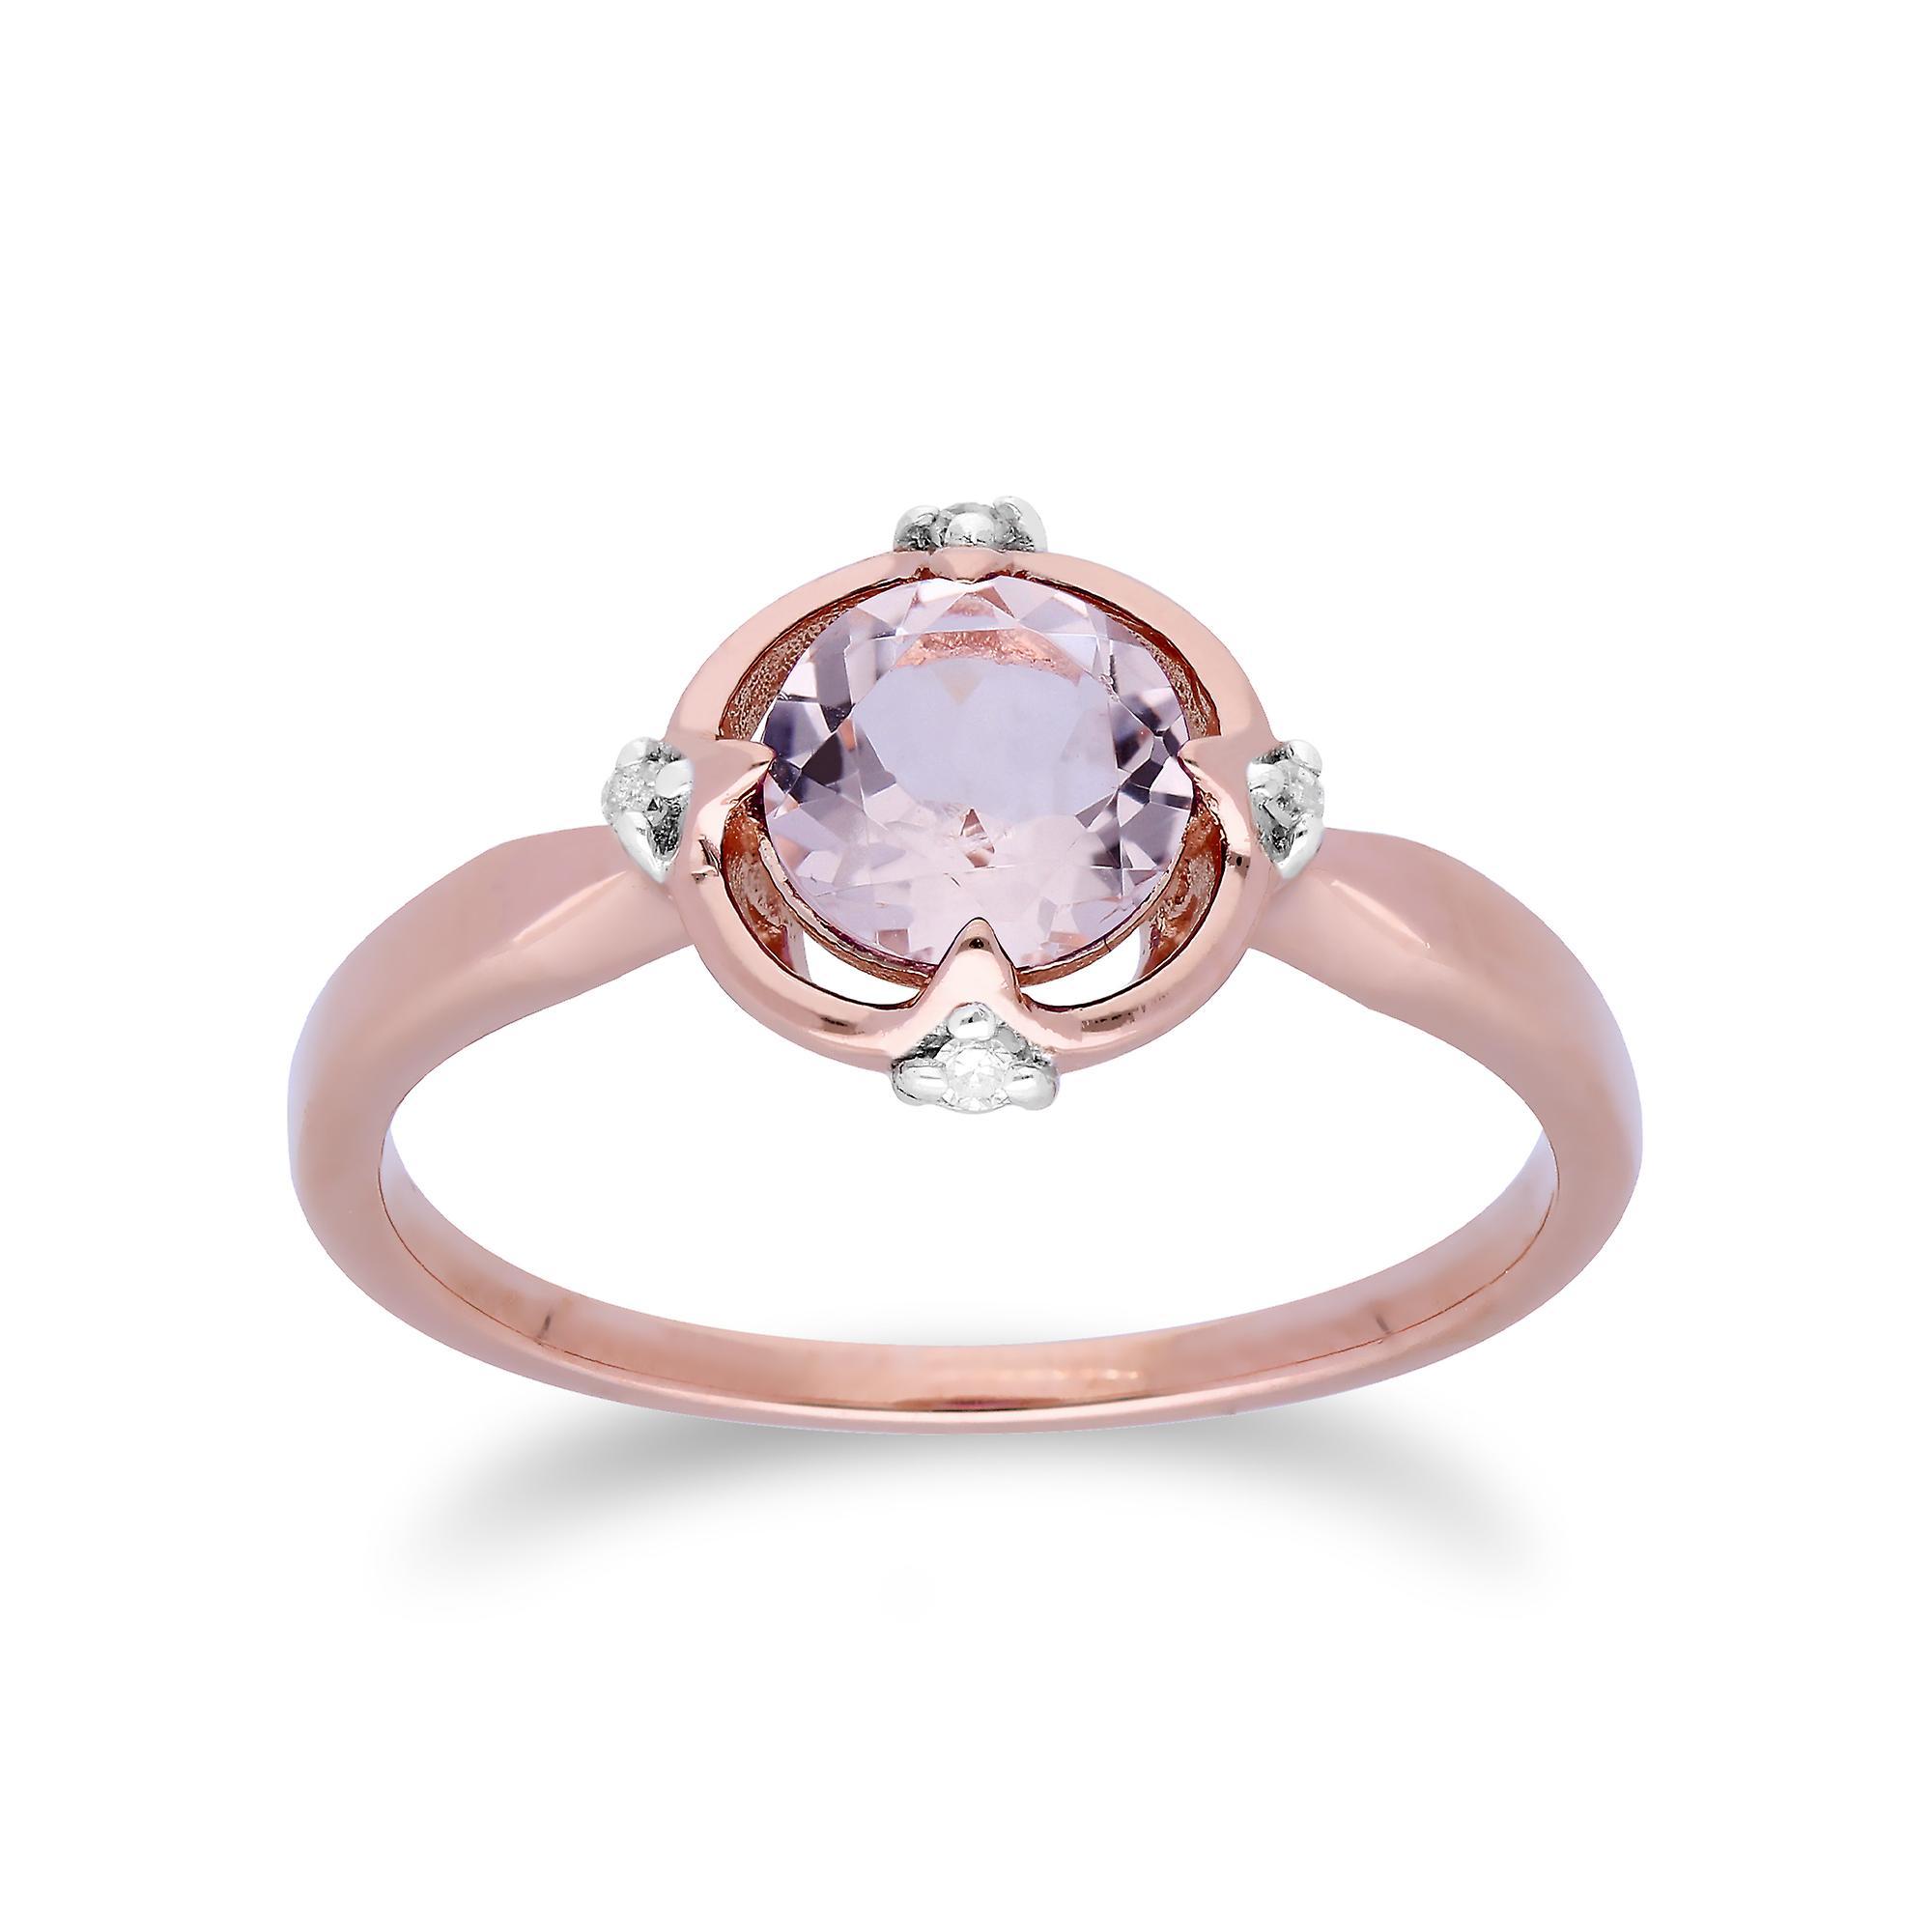 Gemondo 9ct Rose Gold Halo Morganite & Diamond Round Cut Ring